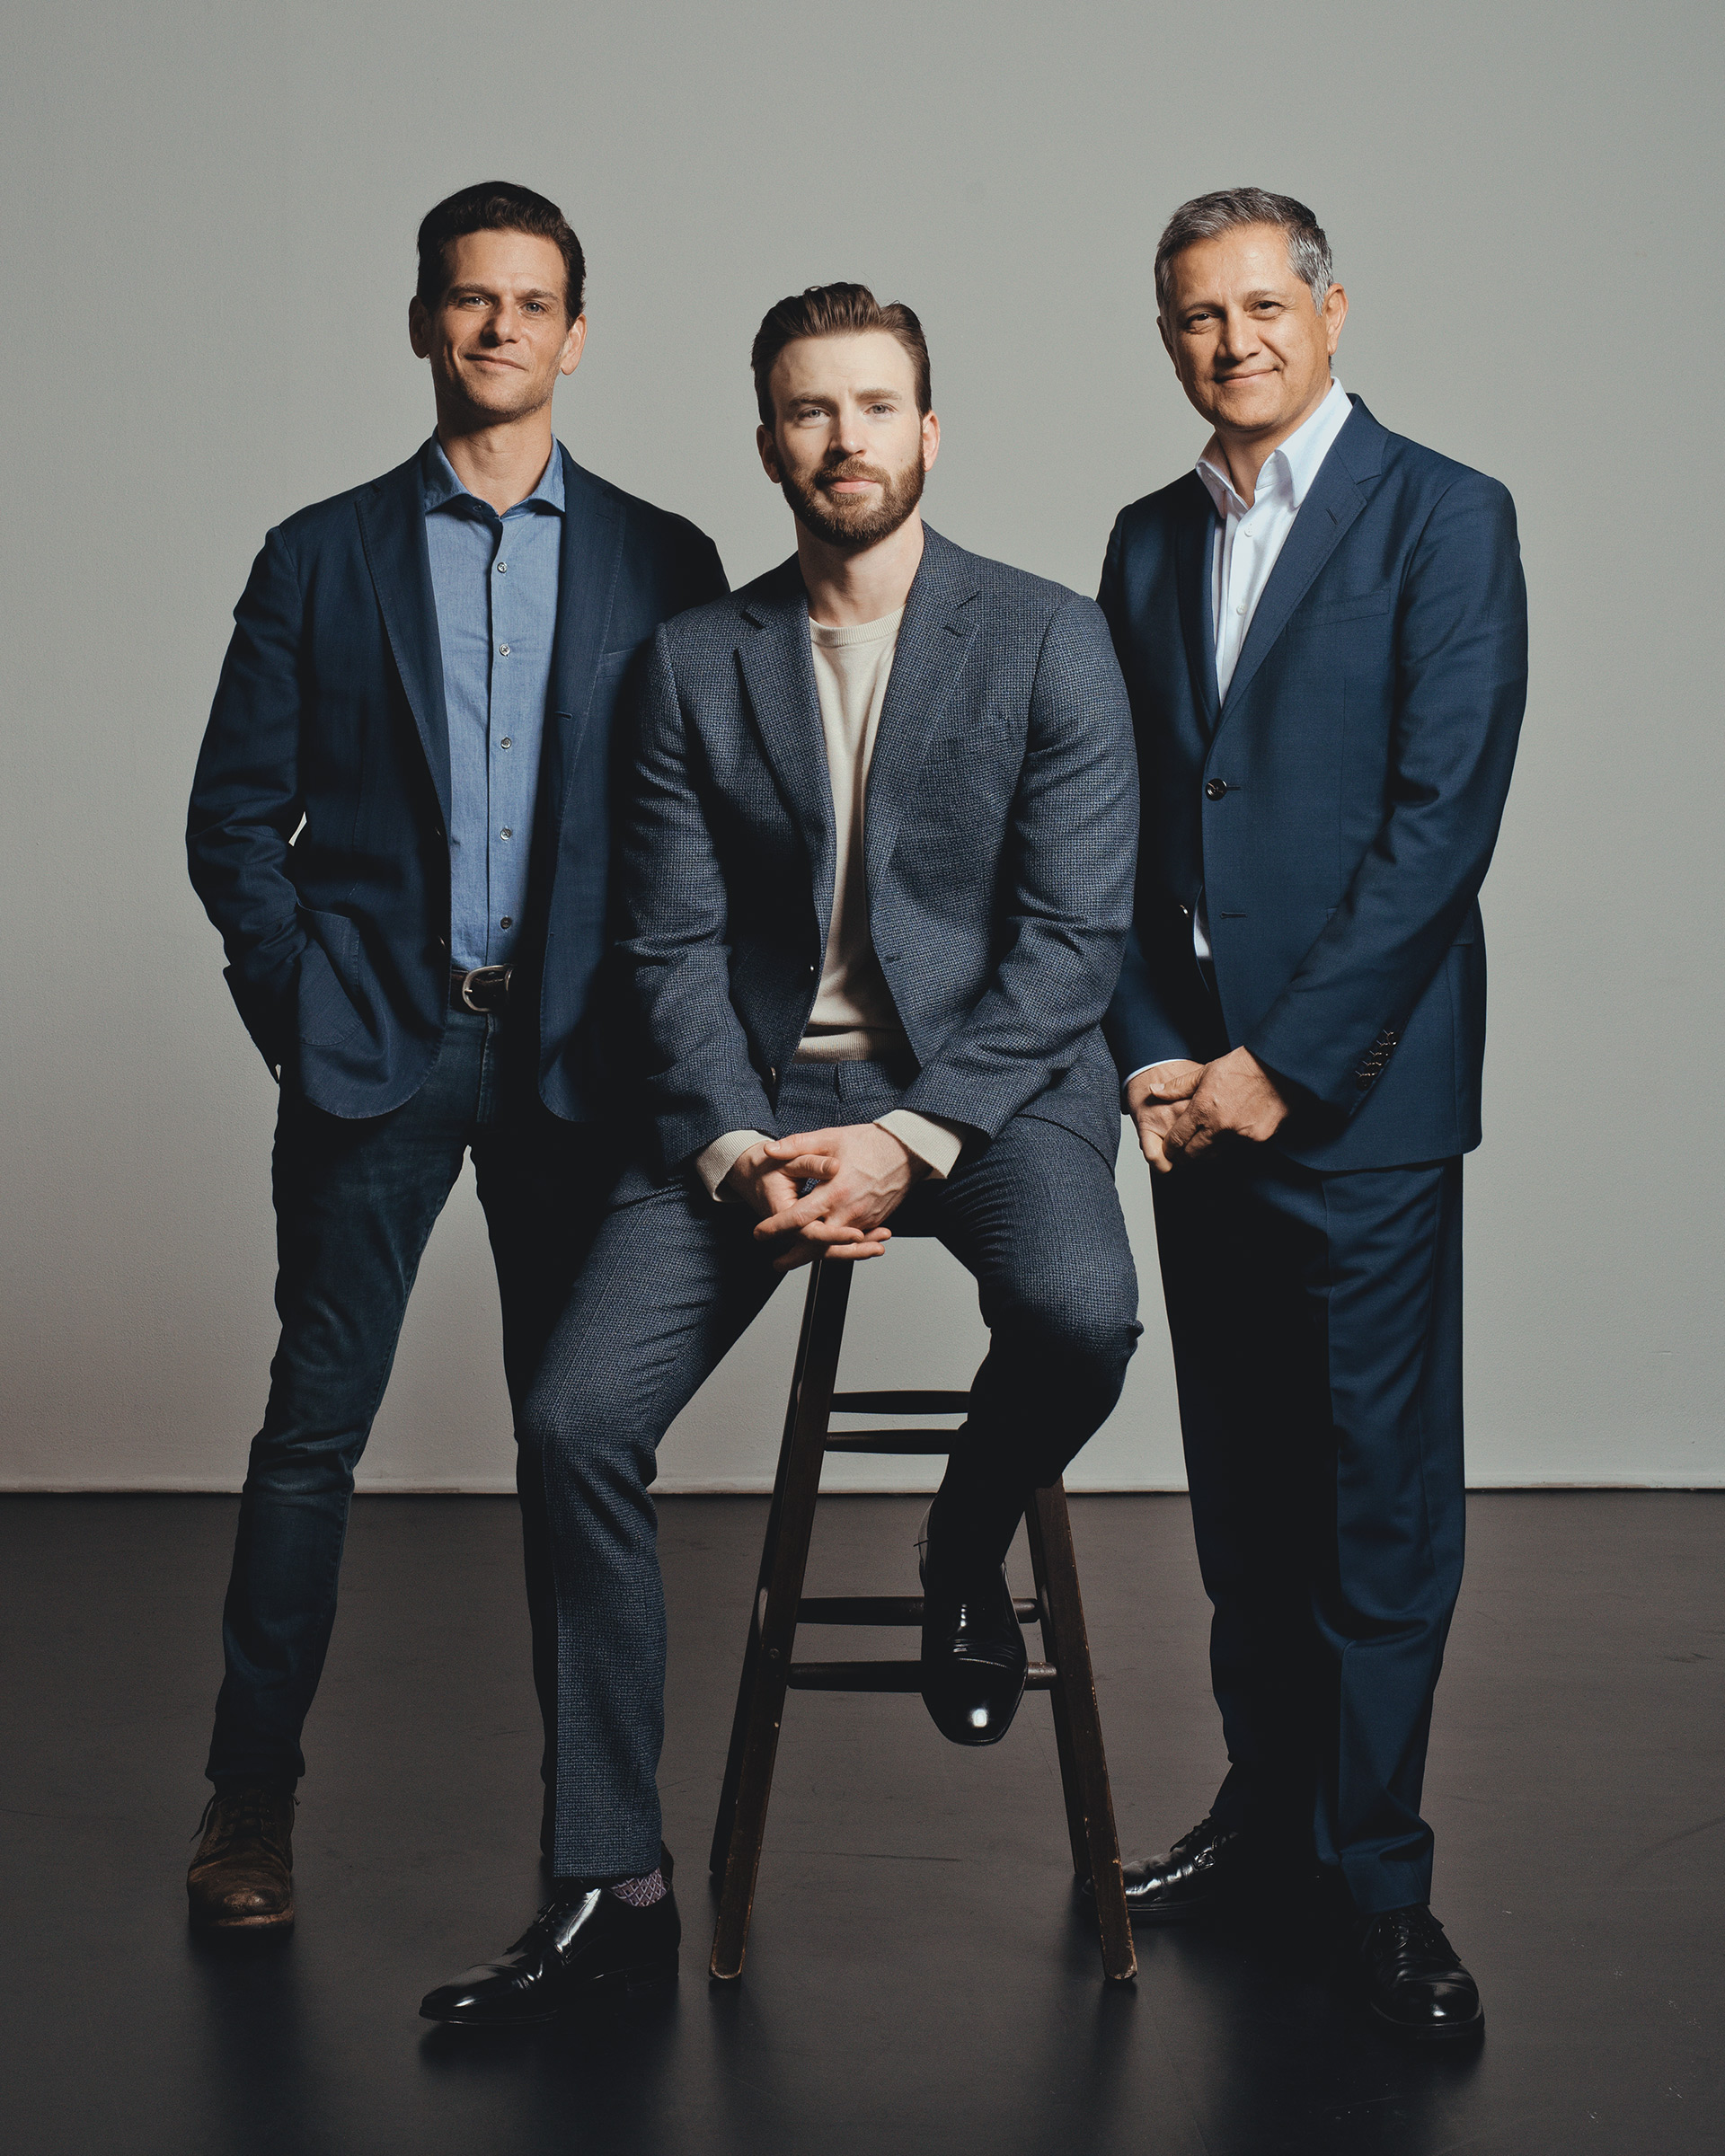 Mark Kassen, Chris Evans and Joe Kiani photographed in Los Angeles, CA on March 11, 2020.